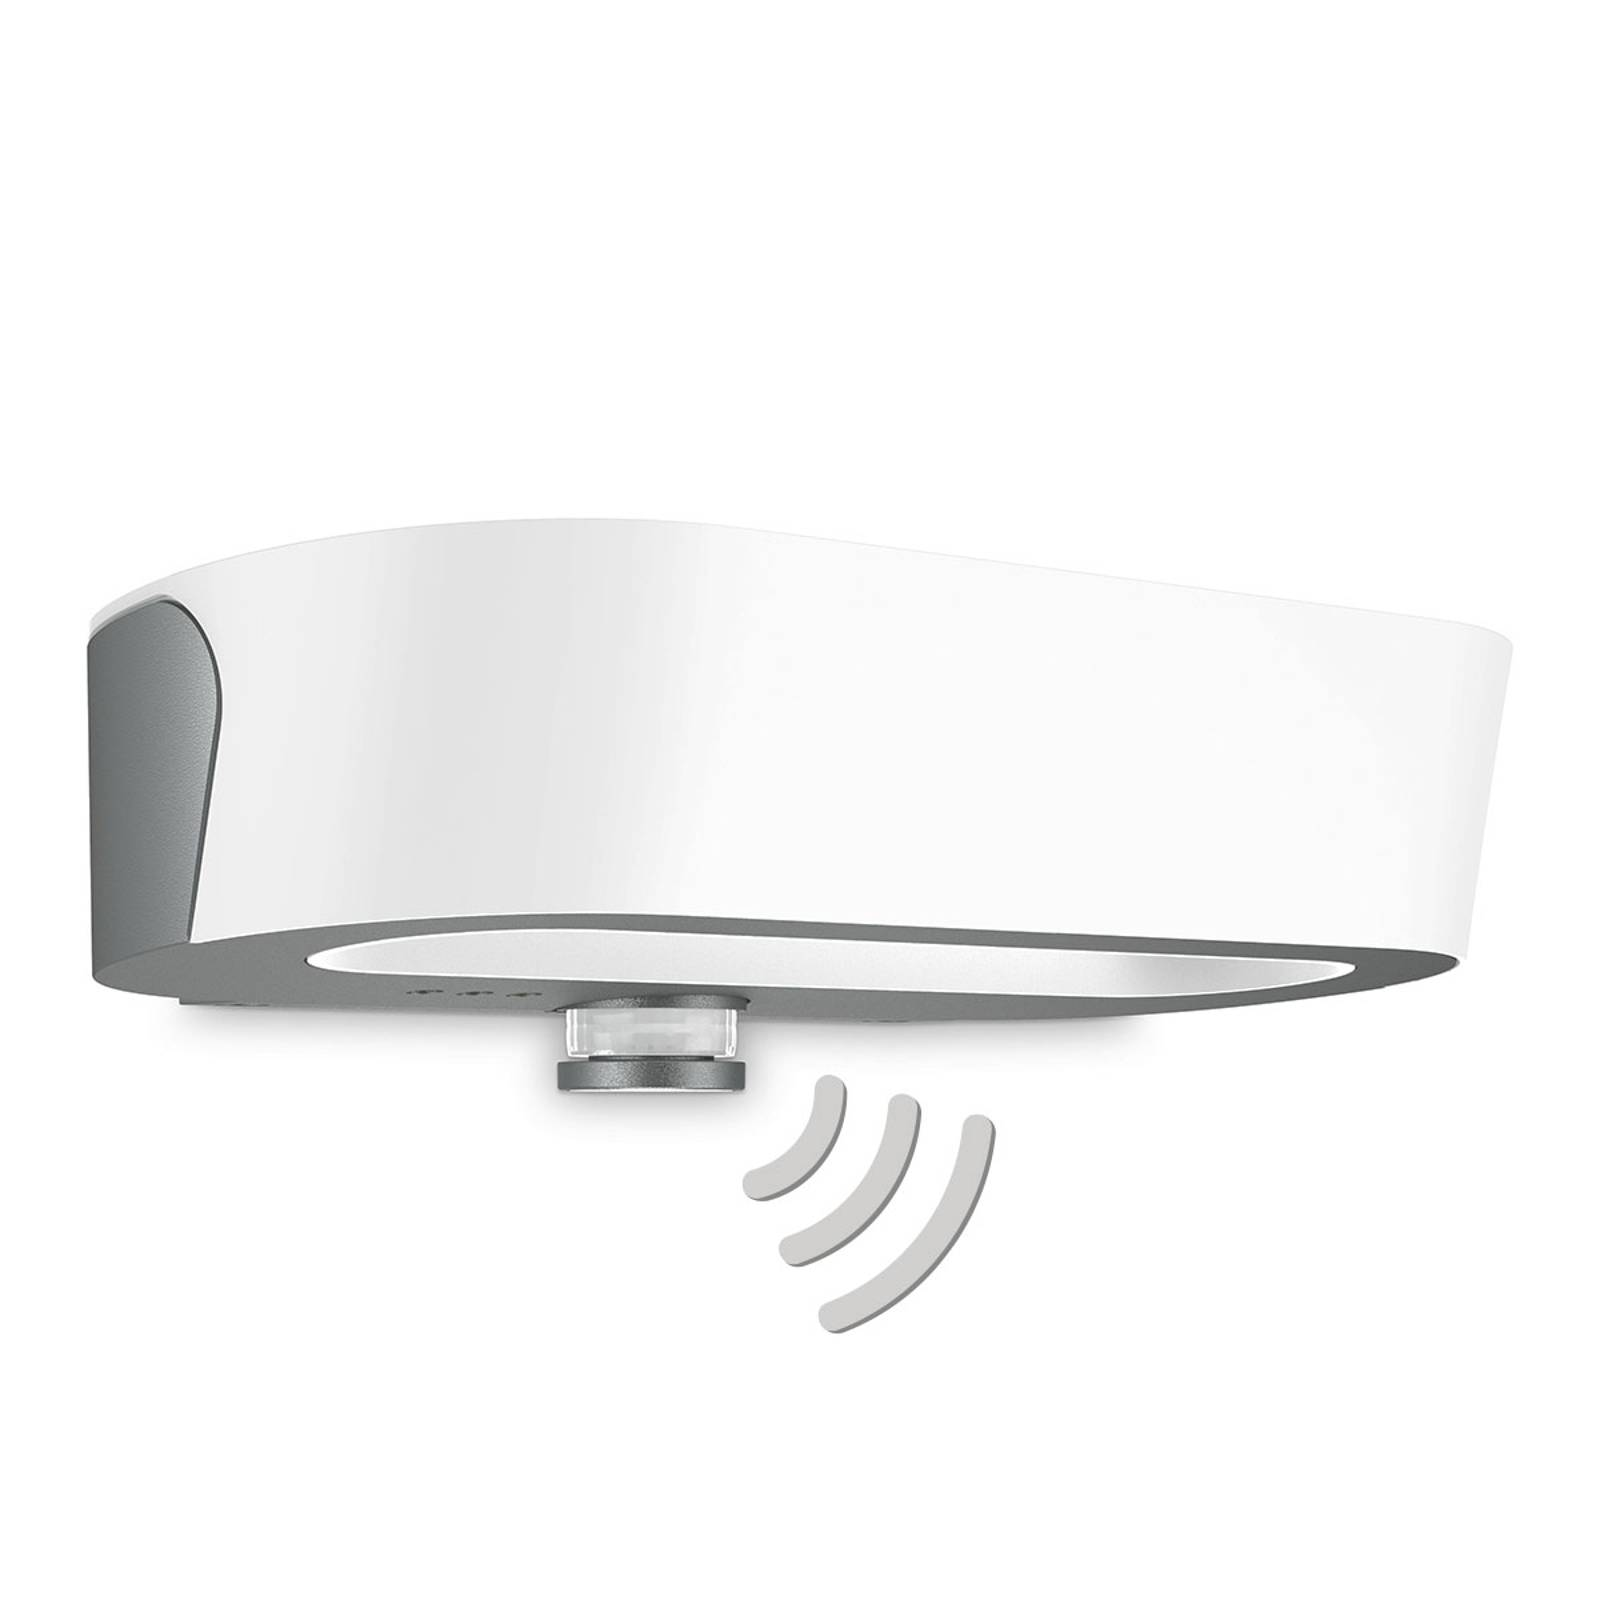 STEINEL L 710 applique LED sensore antracite